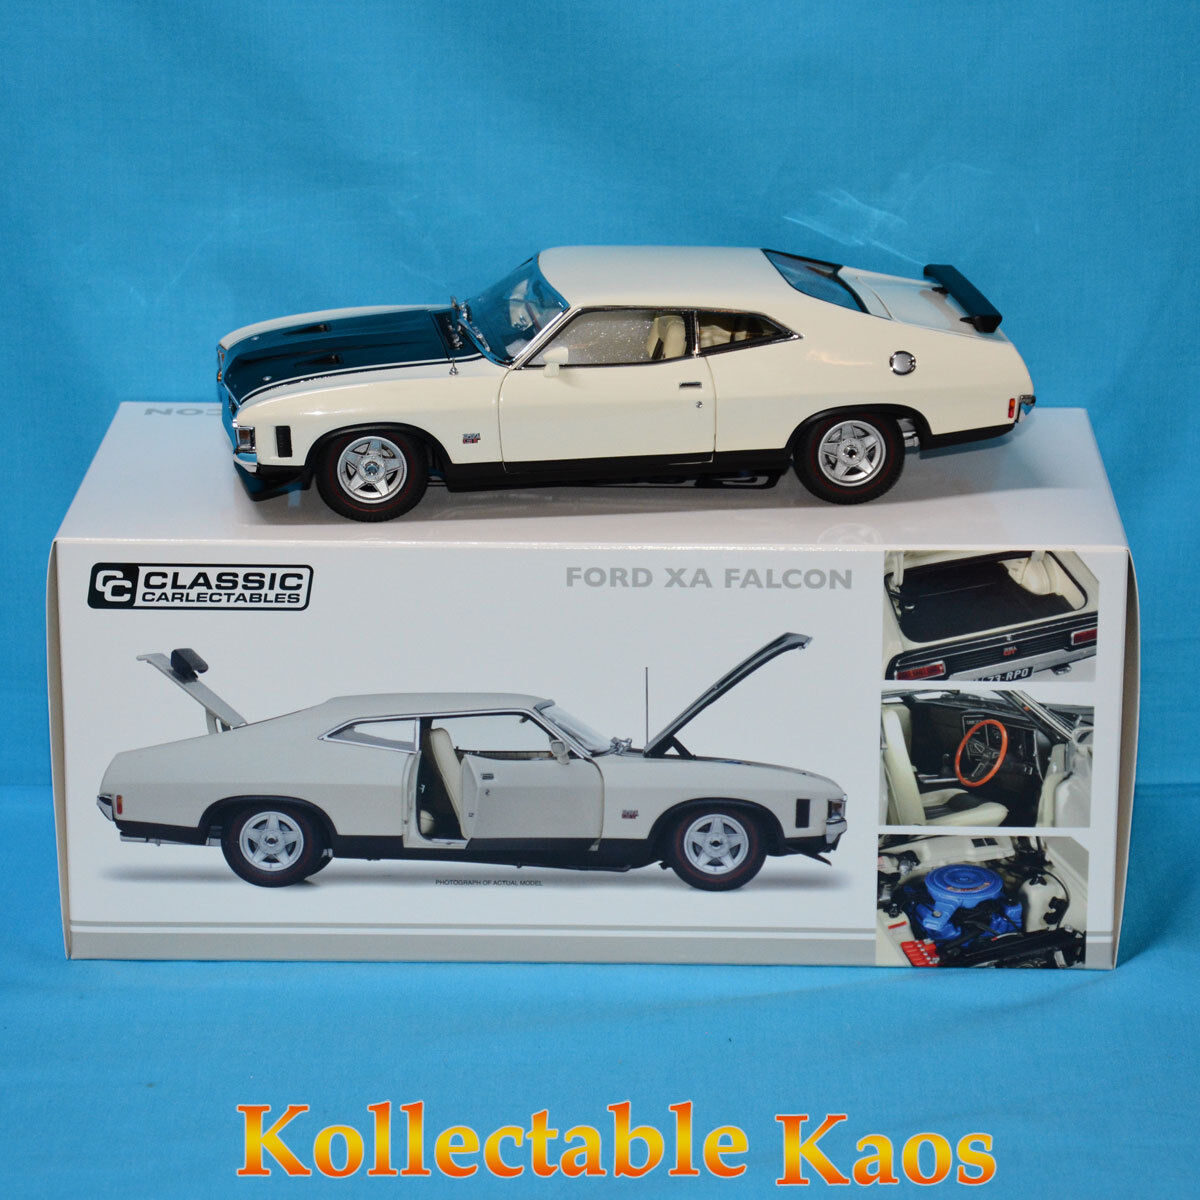 promociones 1 18 18 18 Classics-Ford xa Falcon RPO83 Coupe-blancoo Polar  Venta en línea de descuento de fábrica